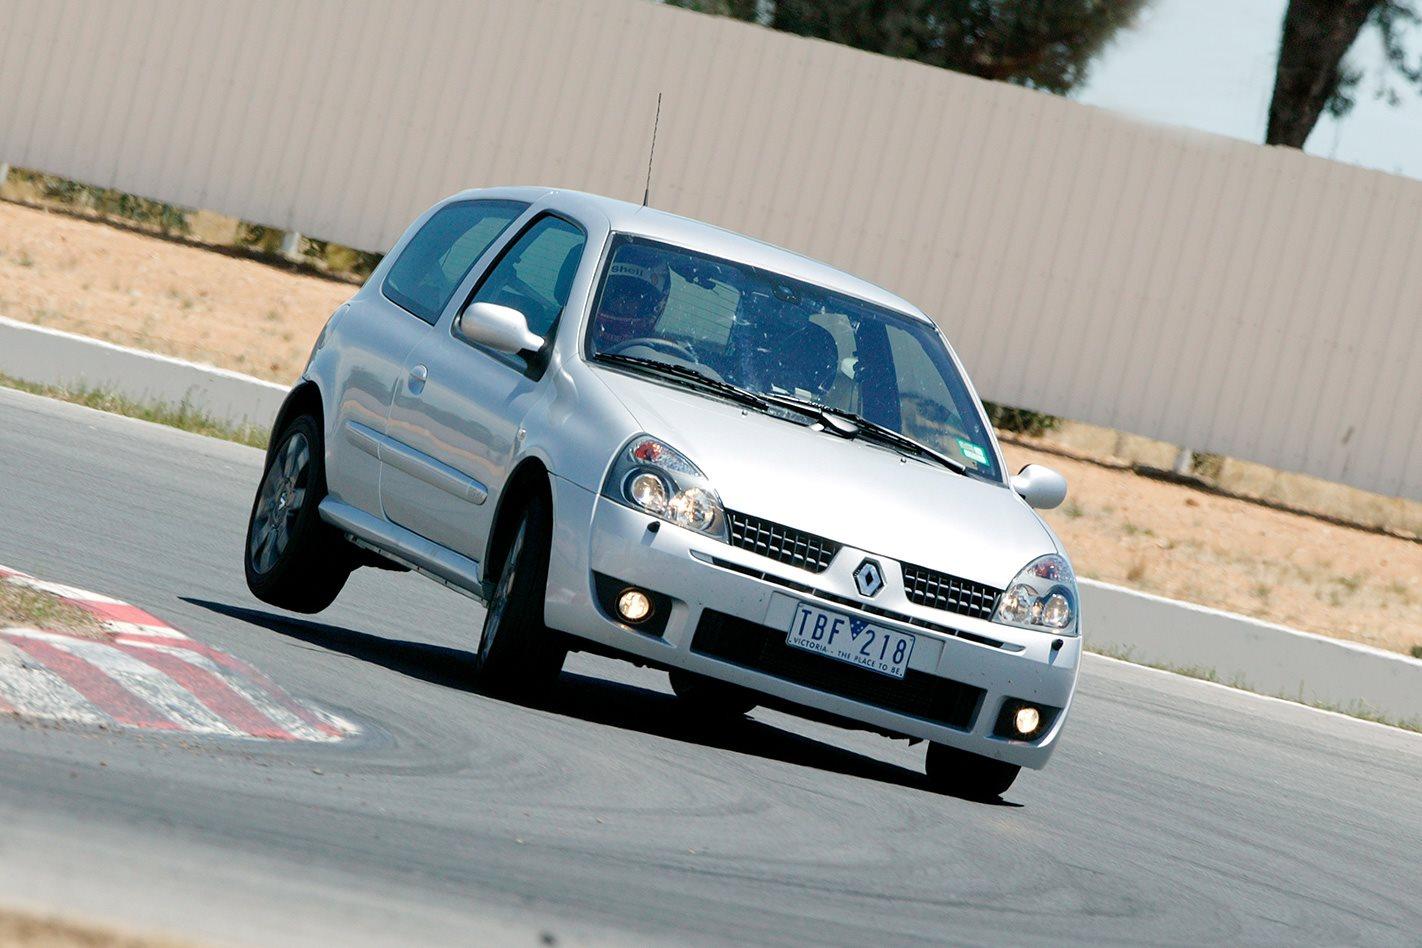 2005-Renault-Sport-Clio-Cup-front.jpg